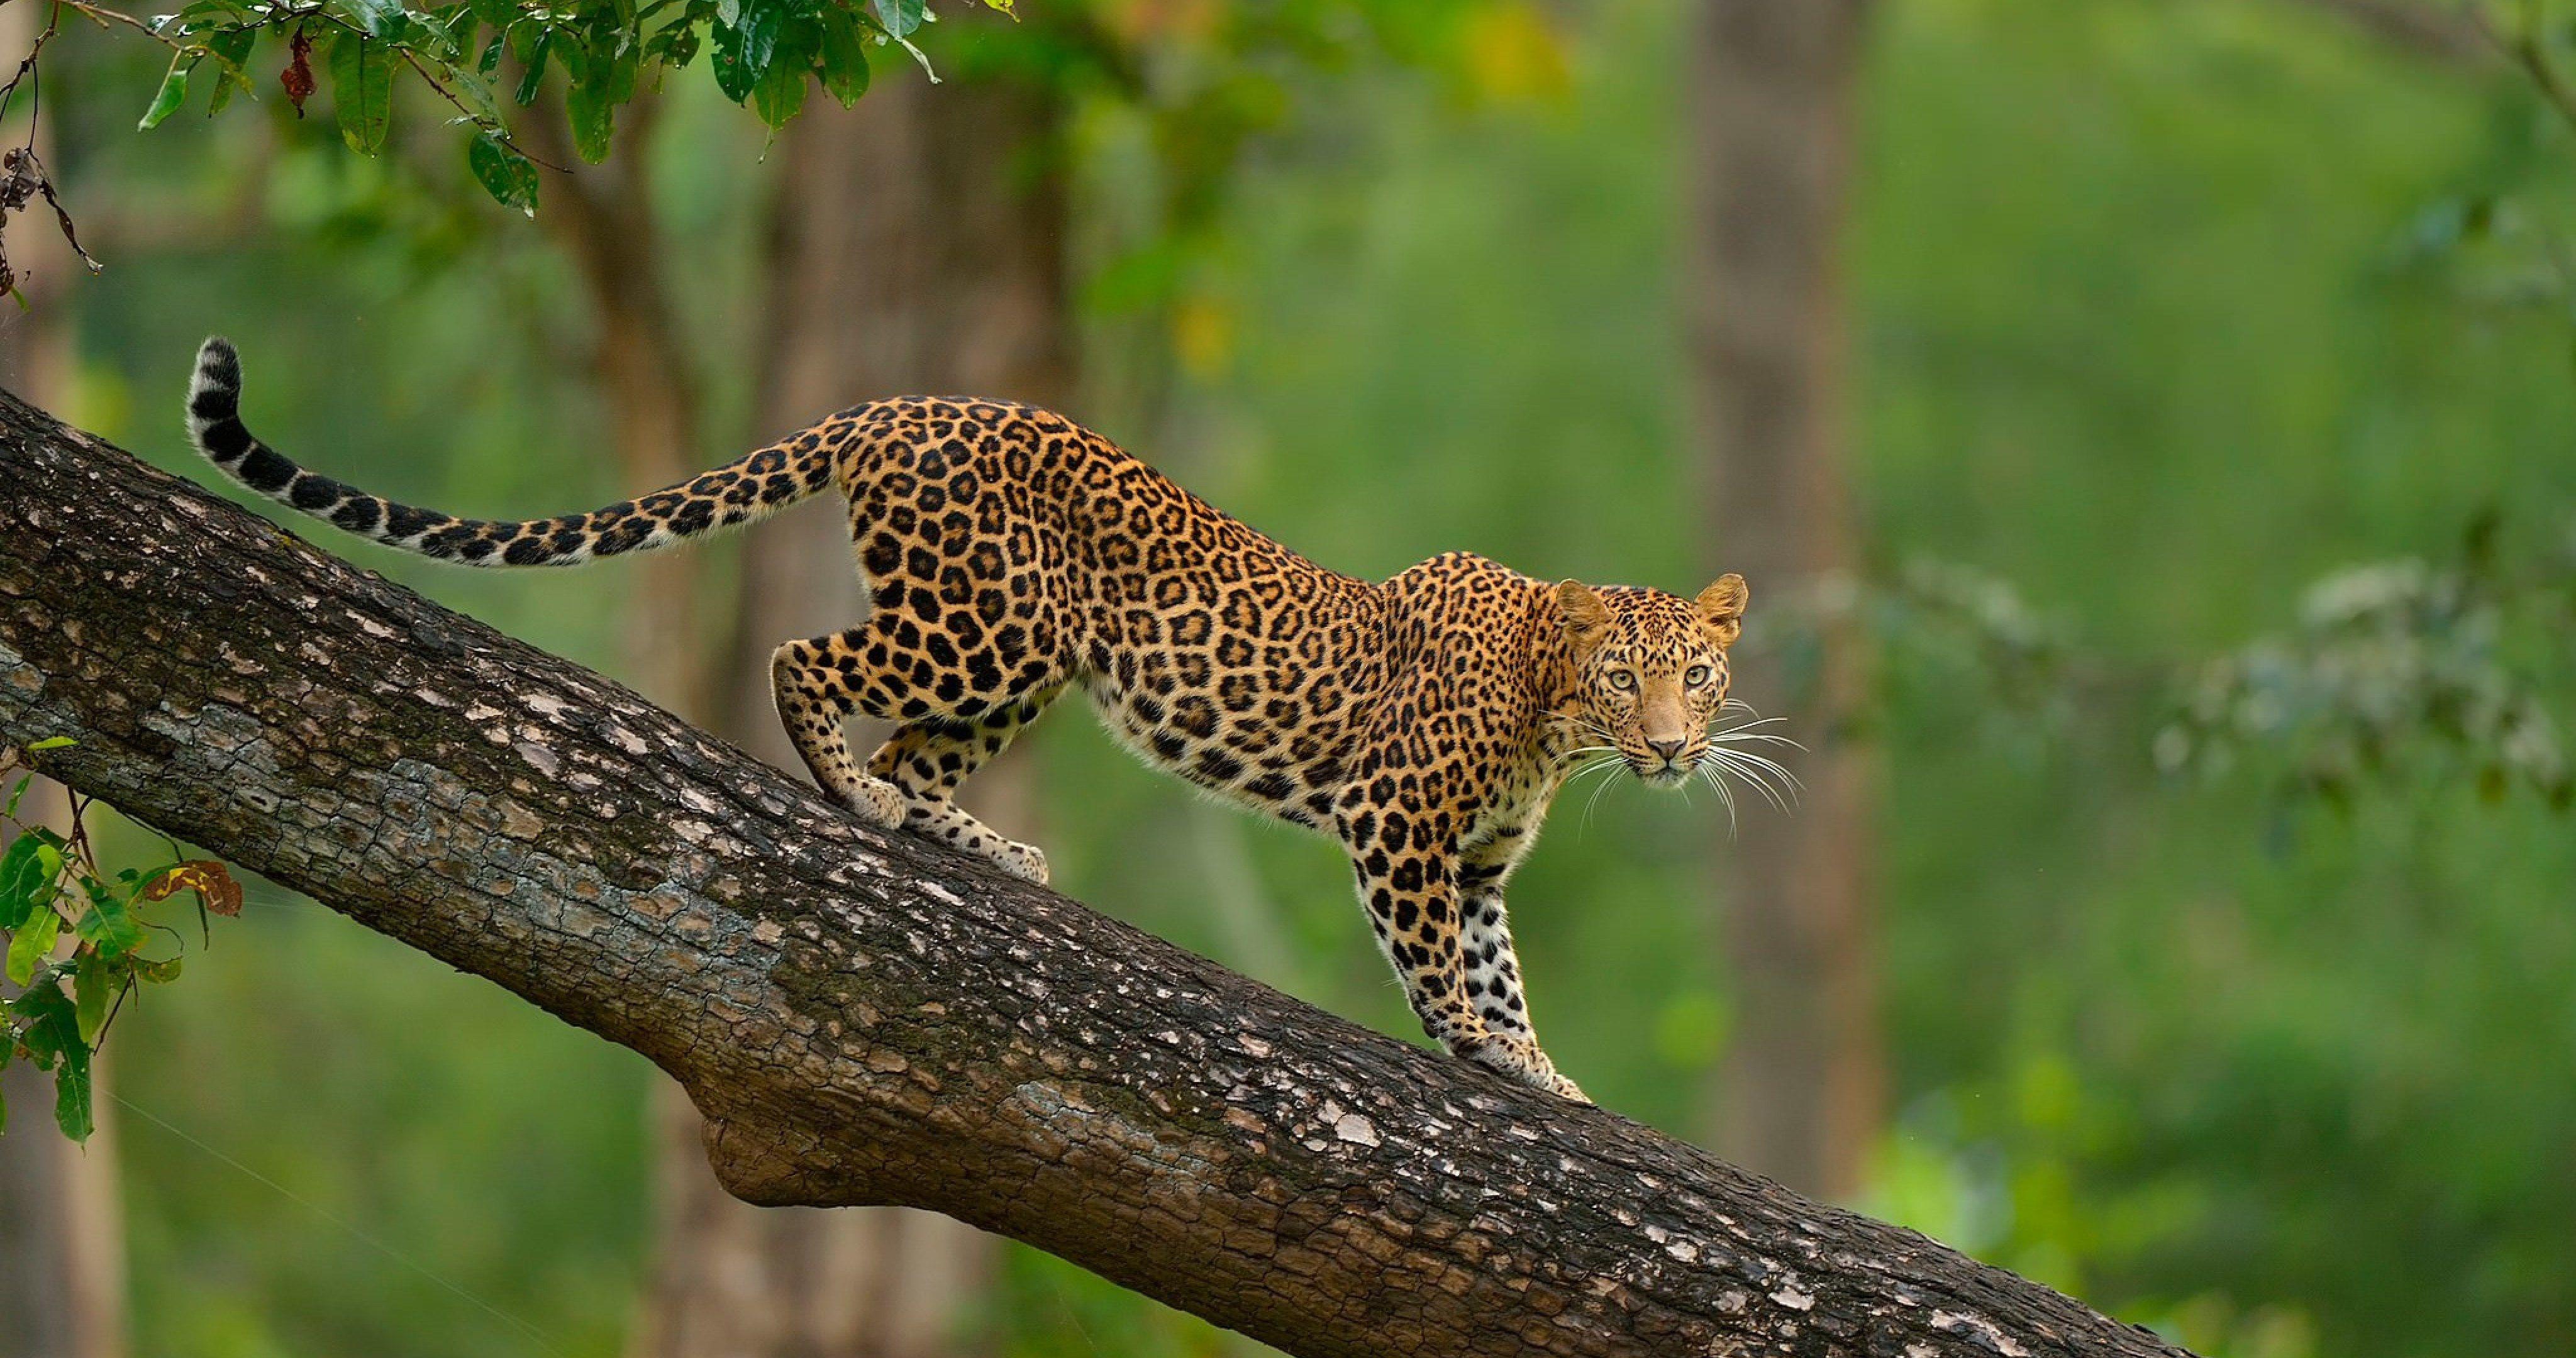 Colorful leopard on tree 4k ultra hd wallpaper - Ultra hd animal wallpapers ...